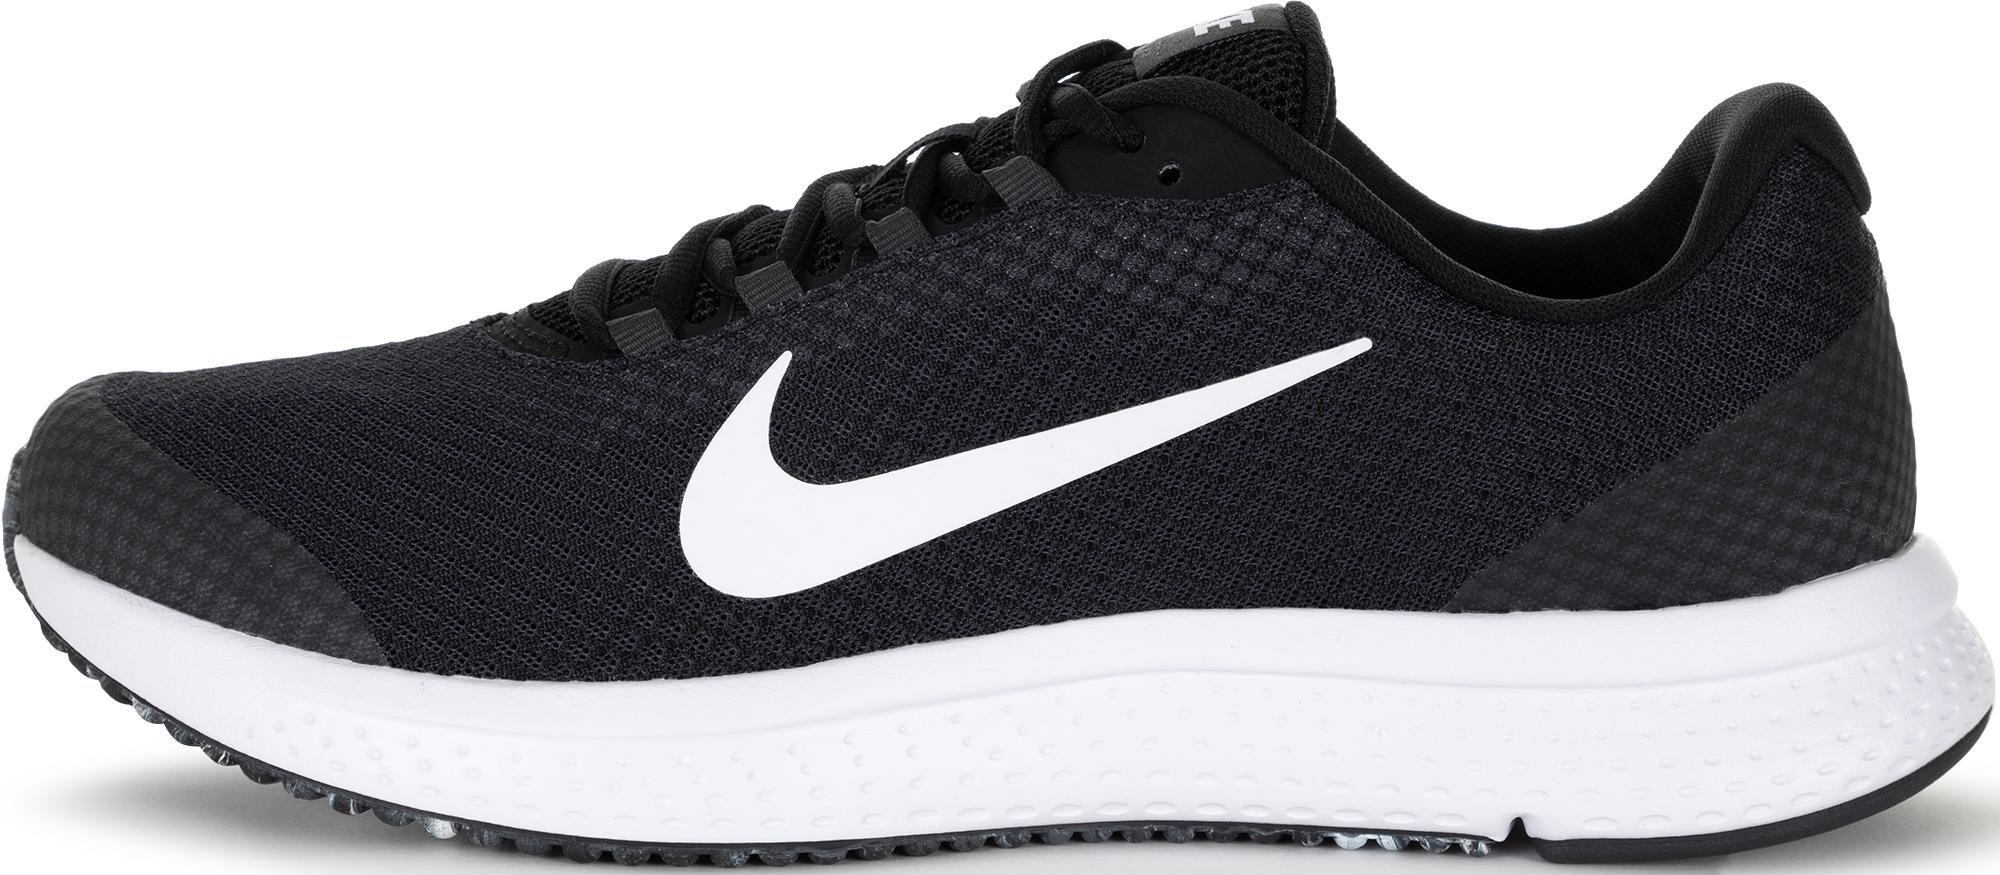 Nike Кроссовки мужские Nike RunAllDay, размер 47,5